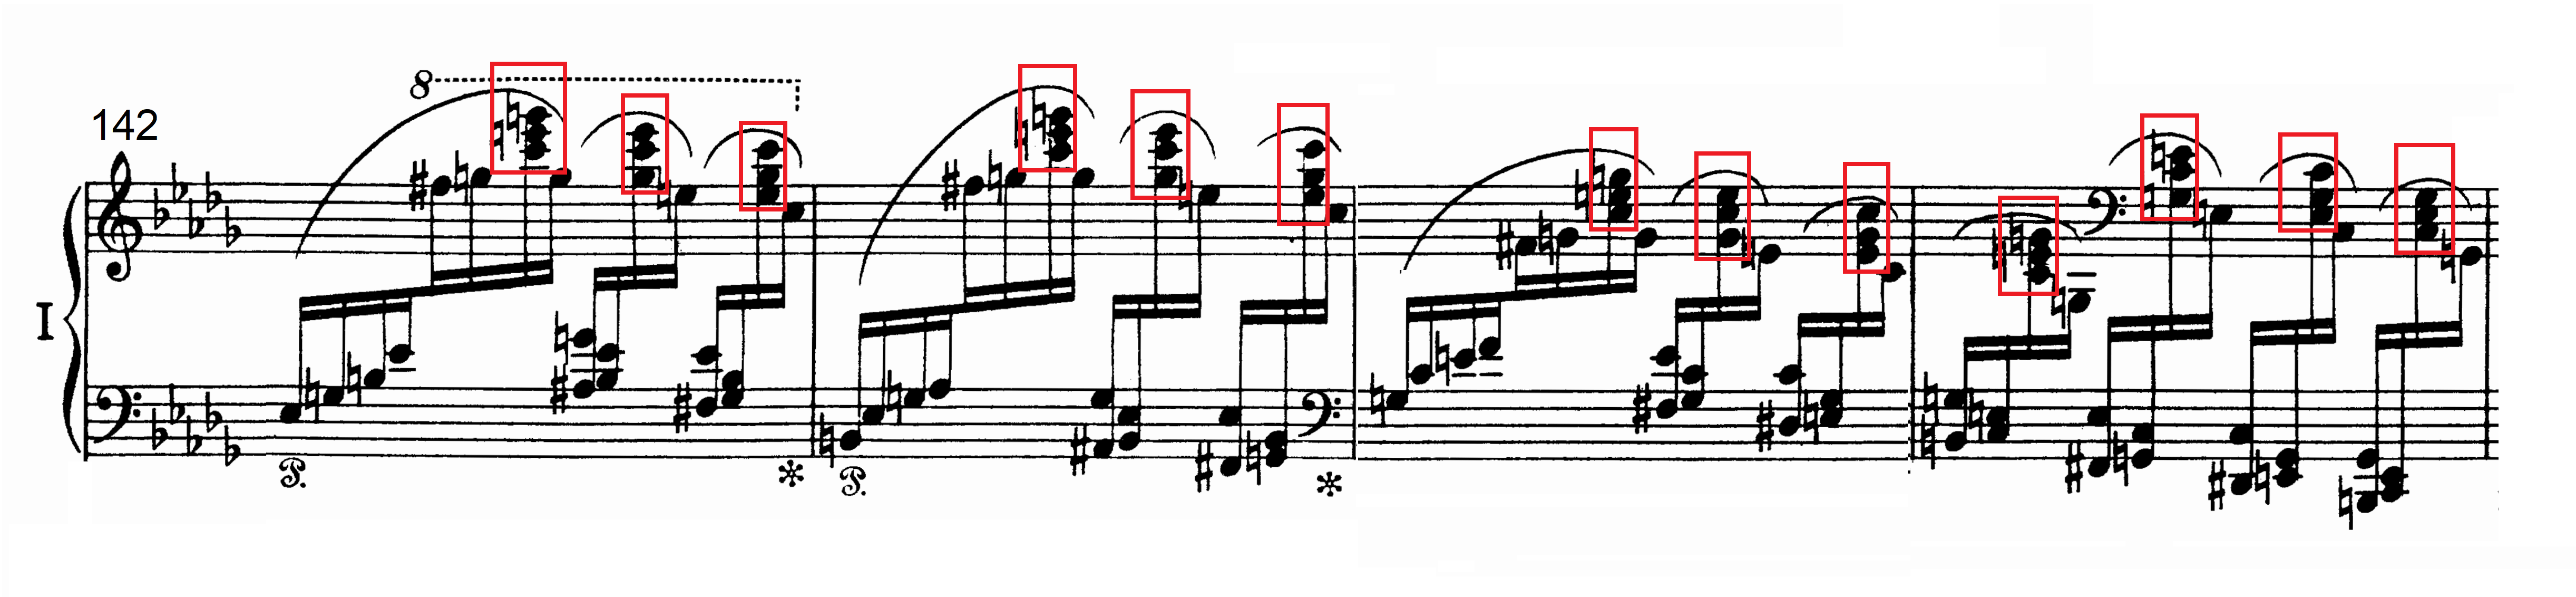 Tchaikovsky Piano Concerto No.1 Masterclass 1.8